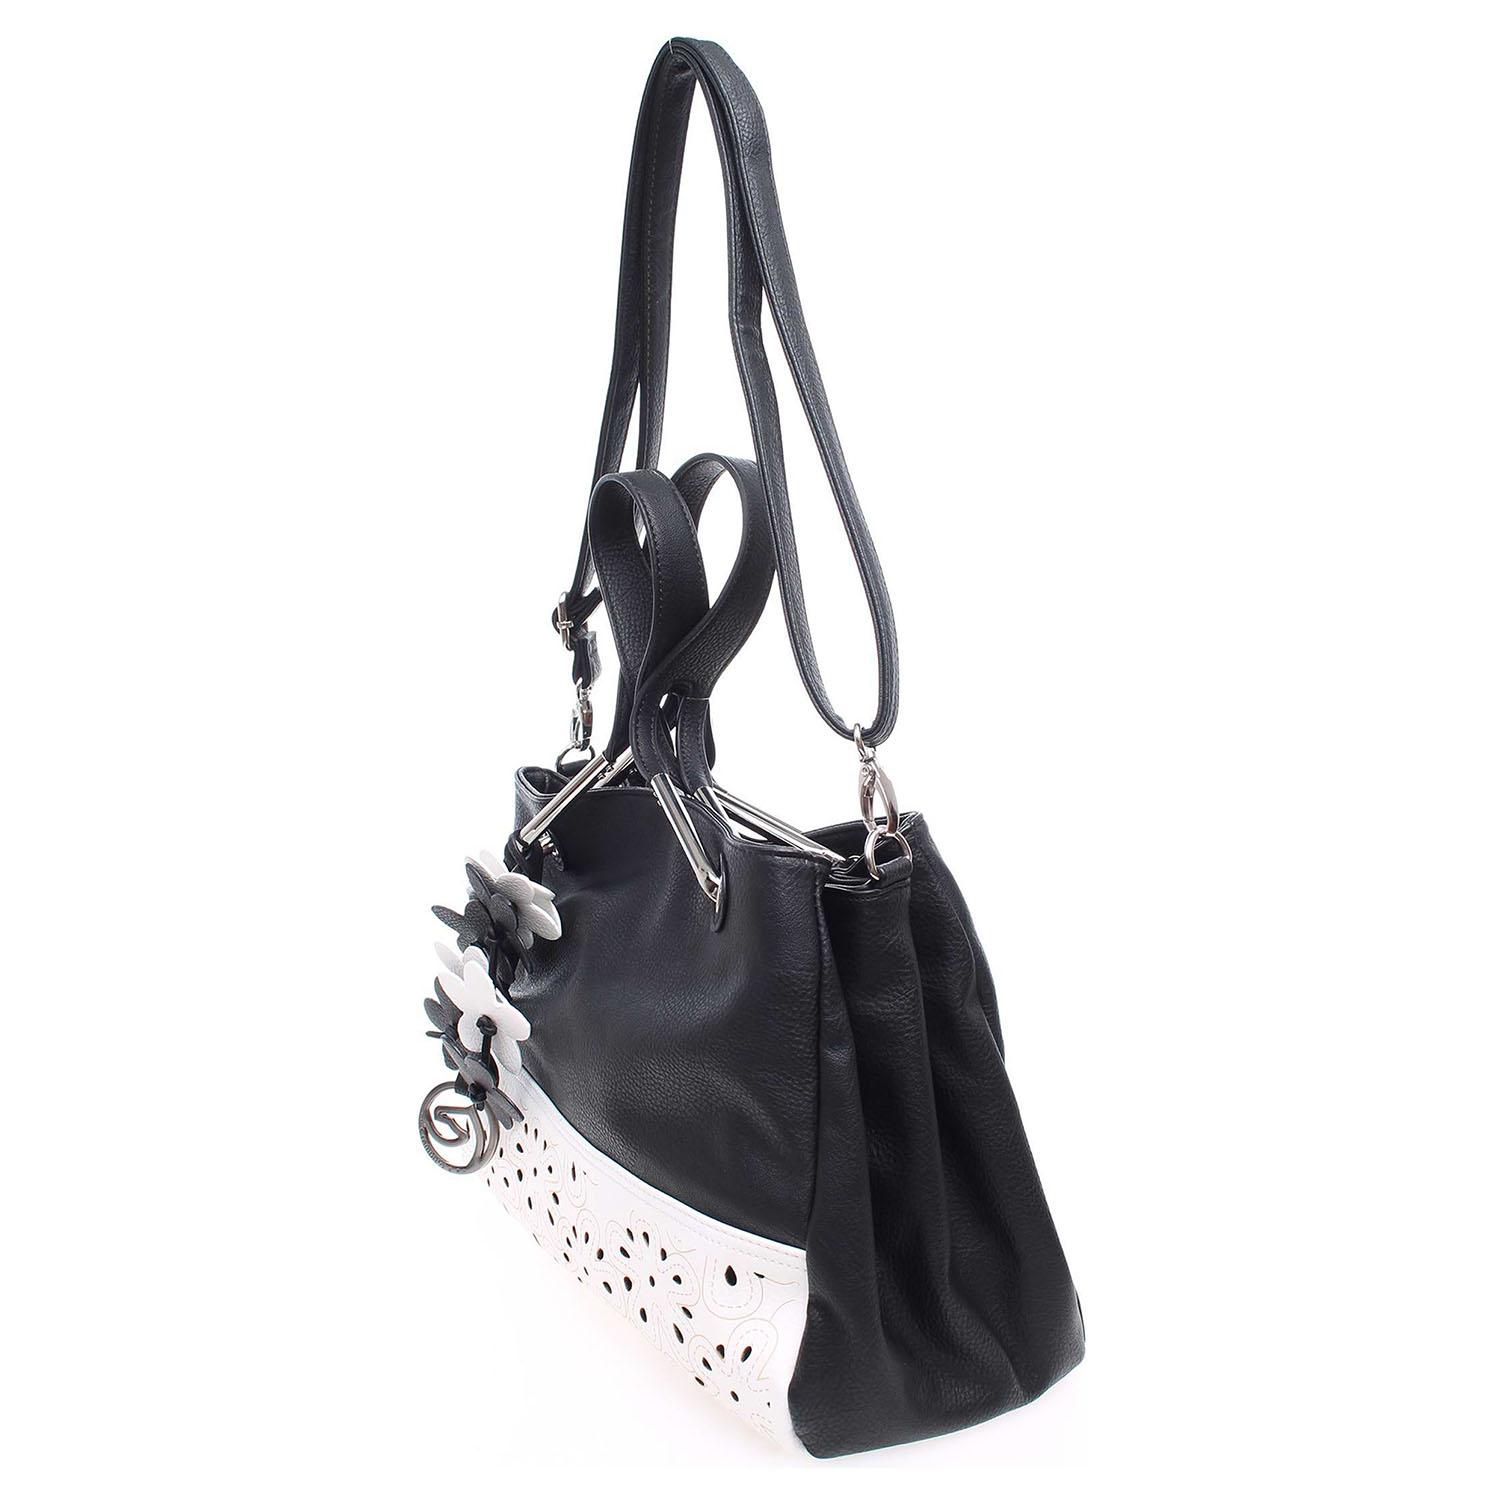 Ecco Remonte kabelka Q0371-01 černá-bílá 11890923